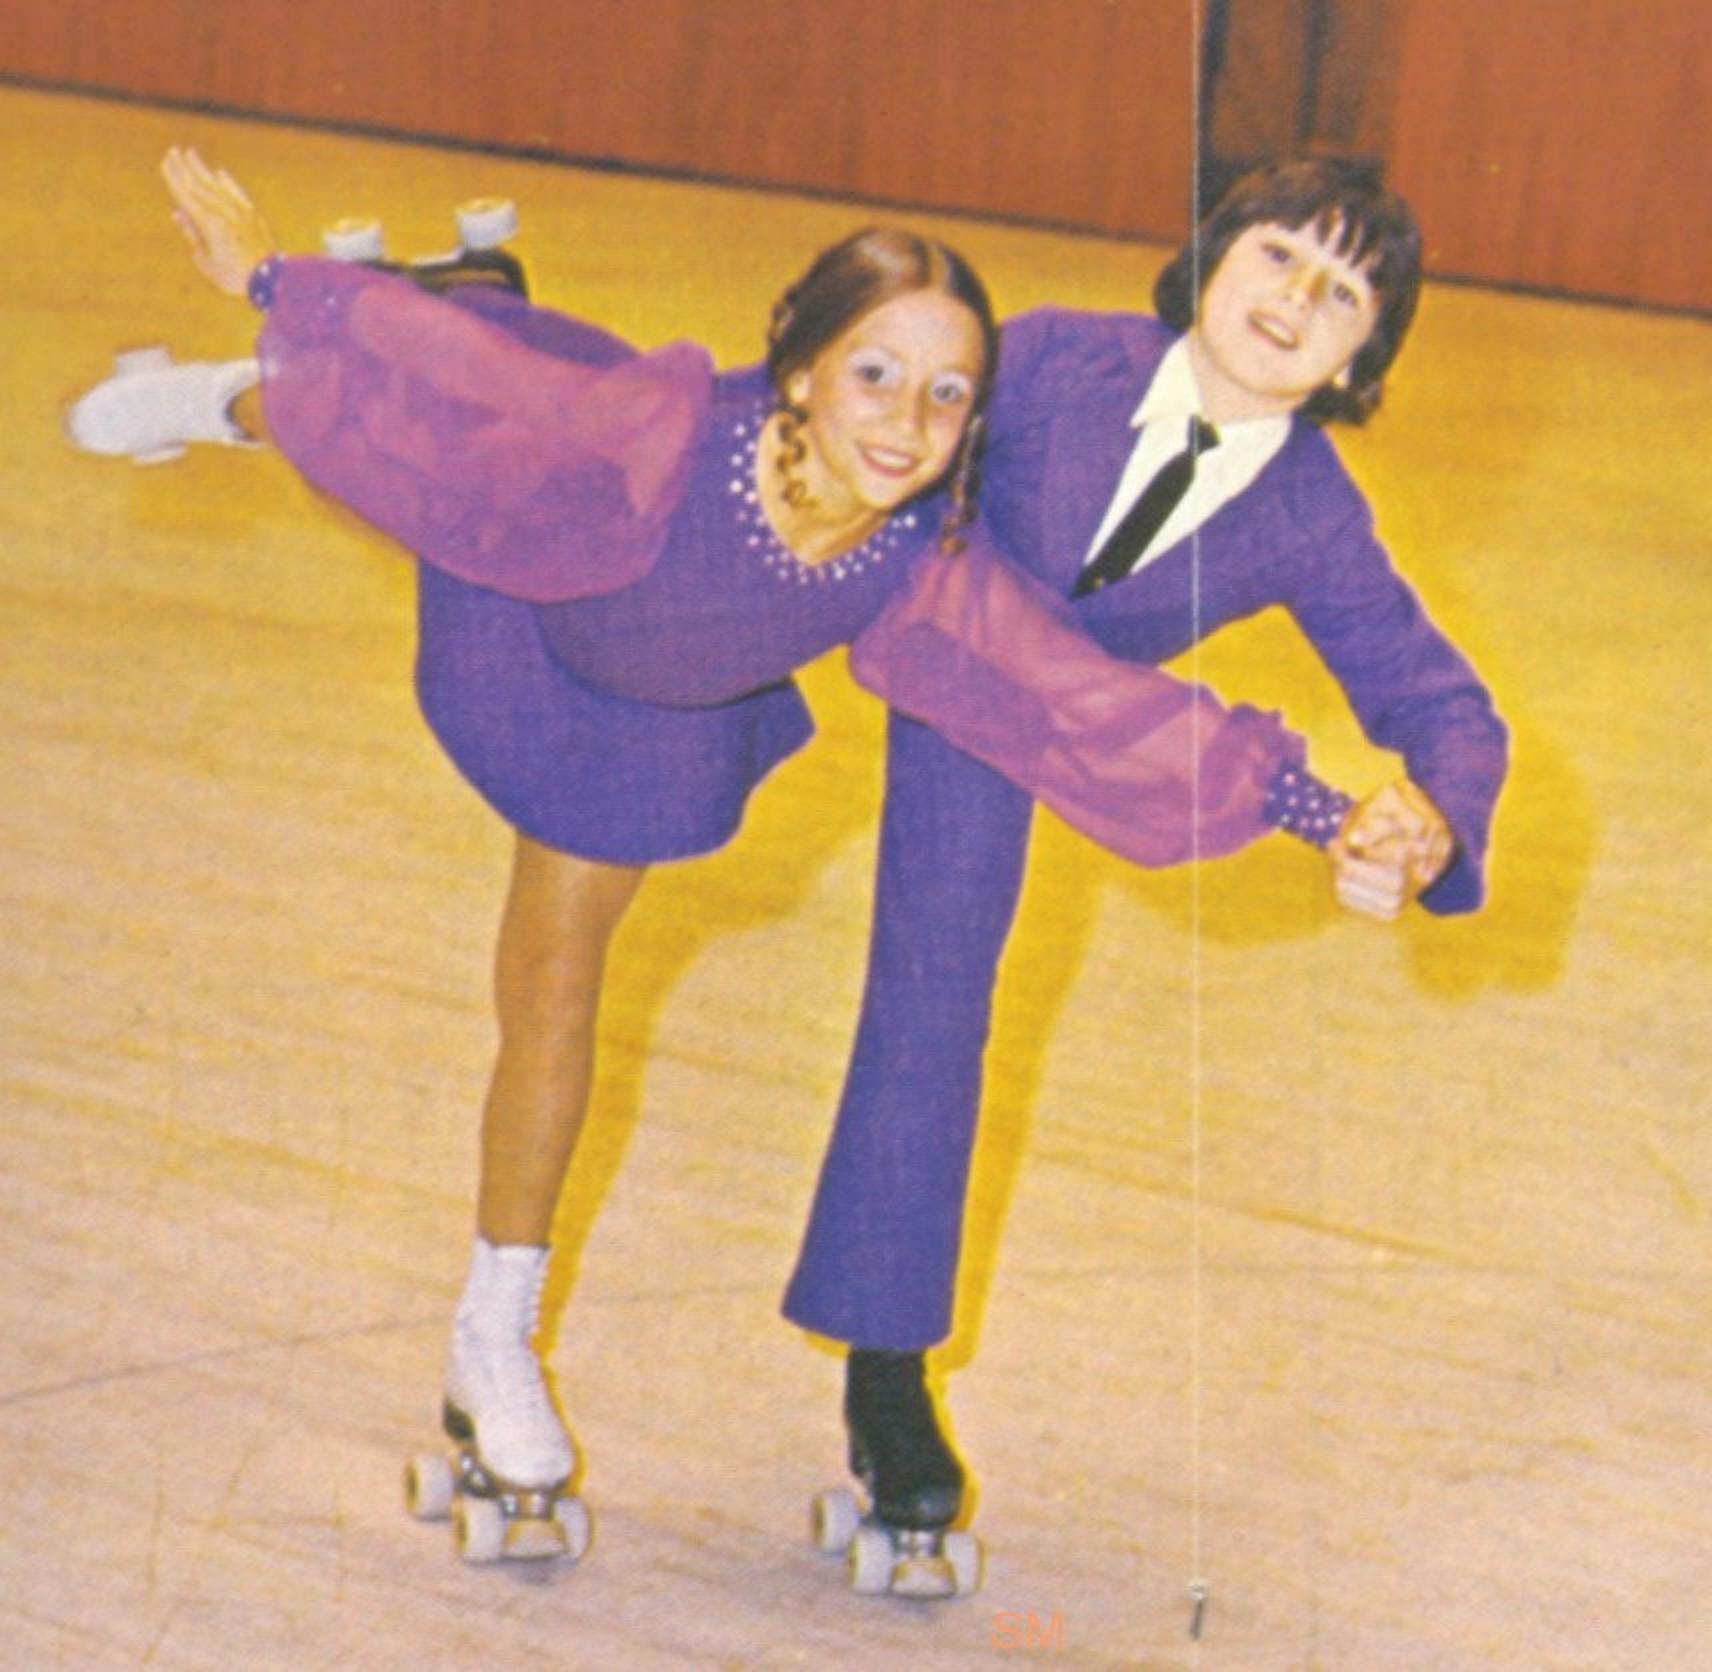 Roller skates in the 70s - Roller Skates In The 70s 58